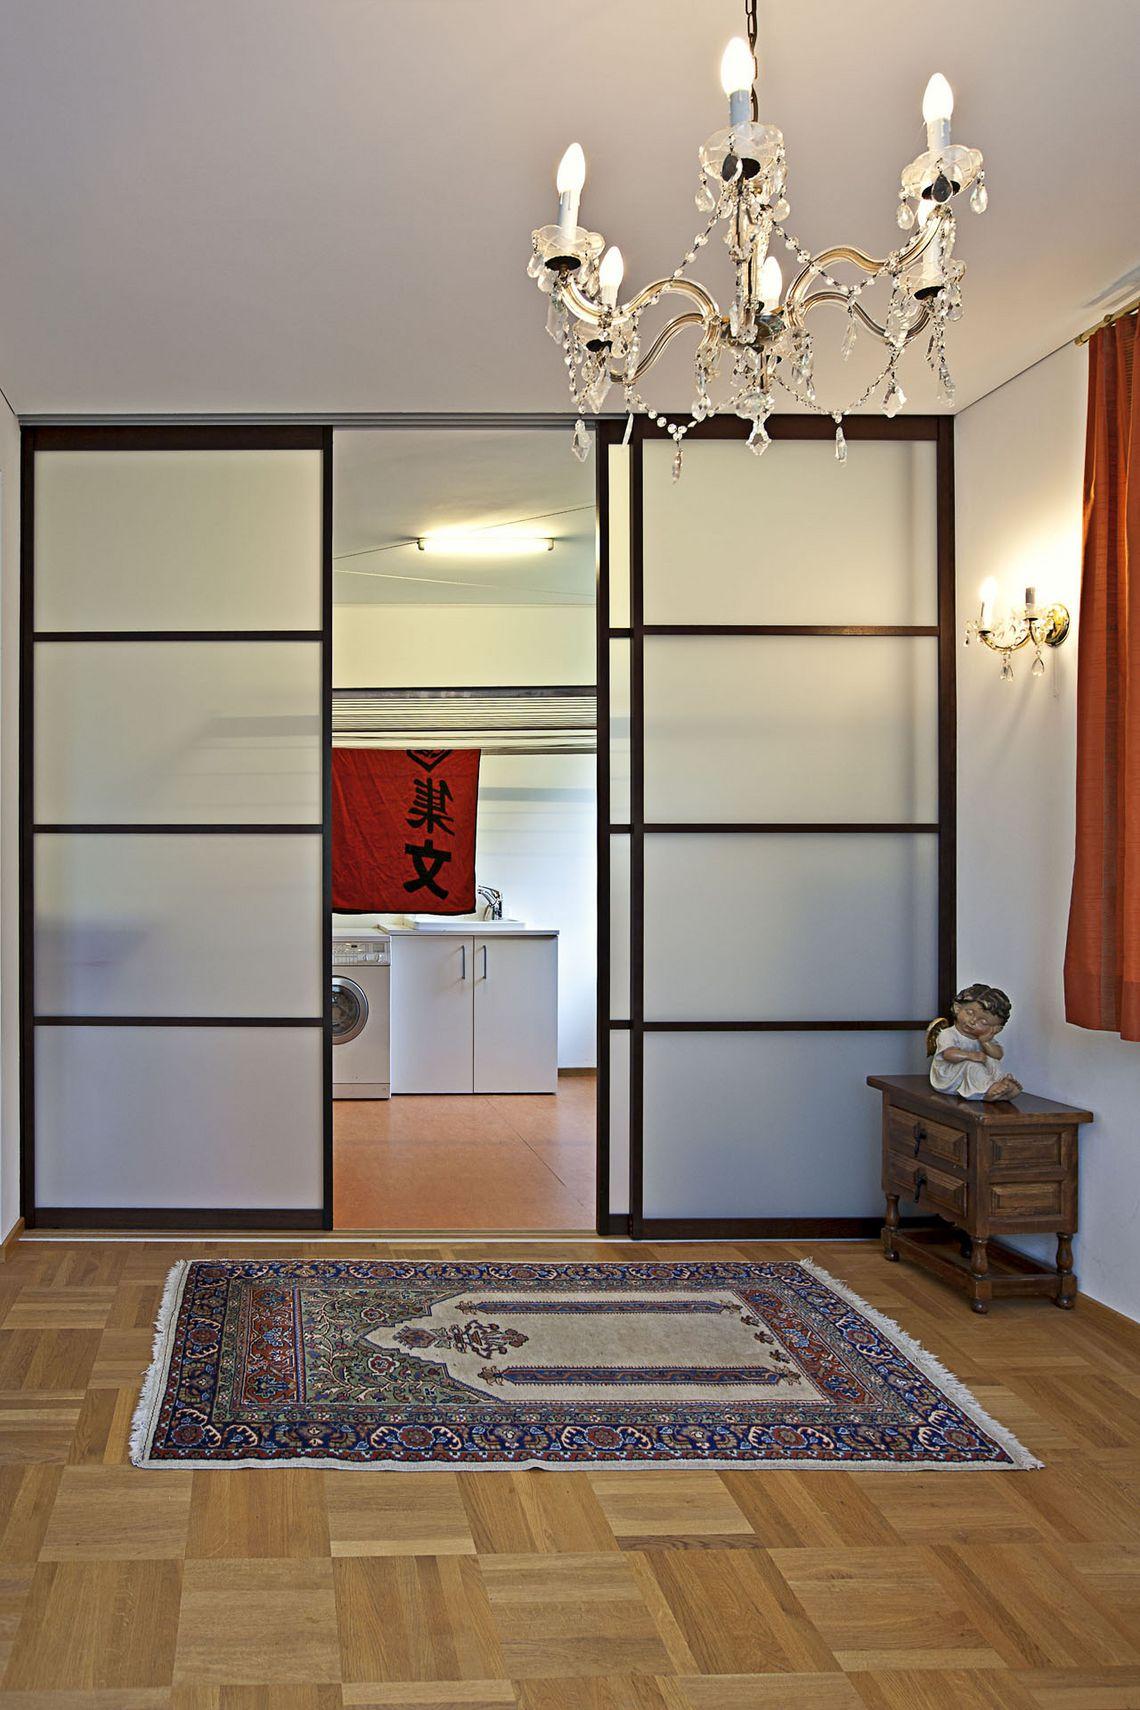 Full Size of Schranksysteme Sofa Kinderzimmer Regal Raumteiler Regale Weiß Kinderzimmer Raumteiler Kinderzimmer